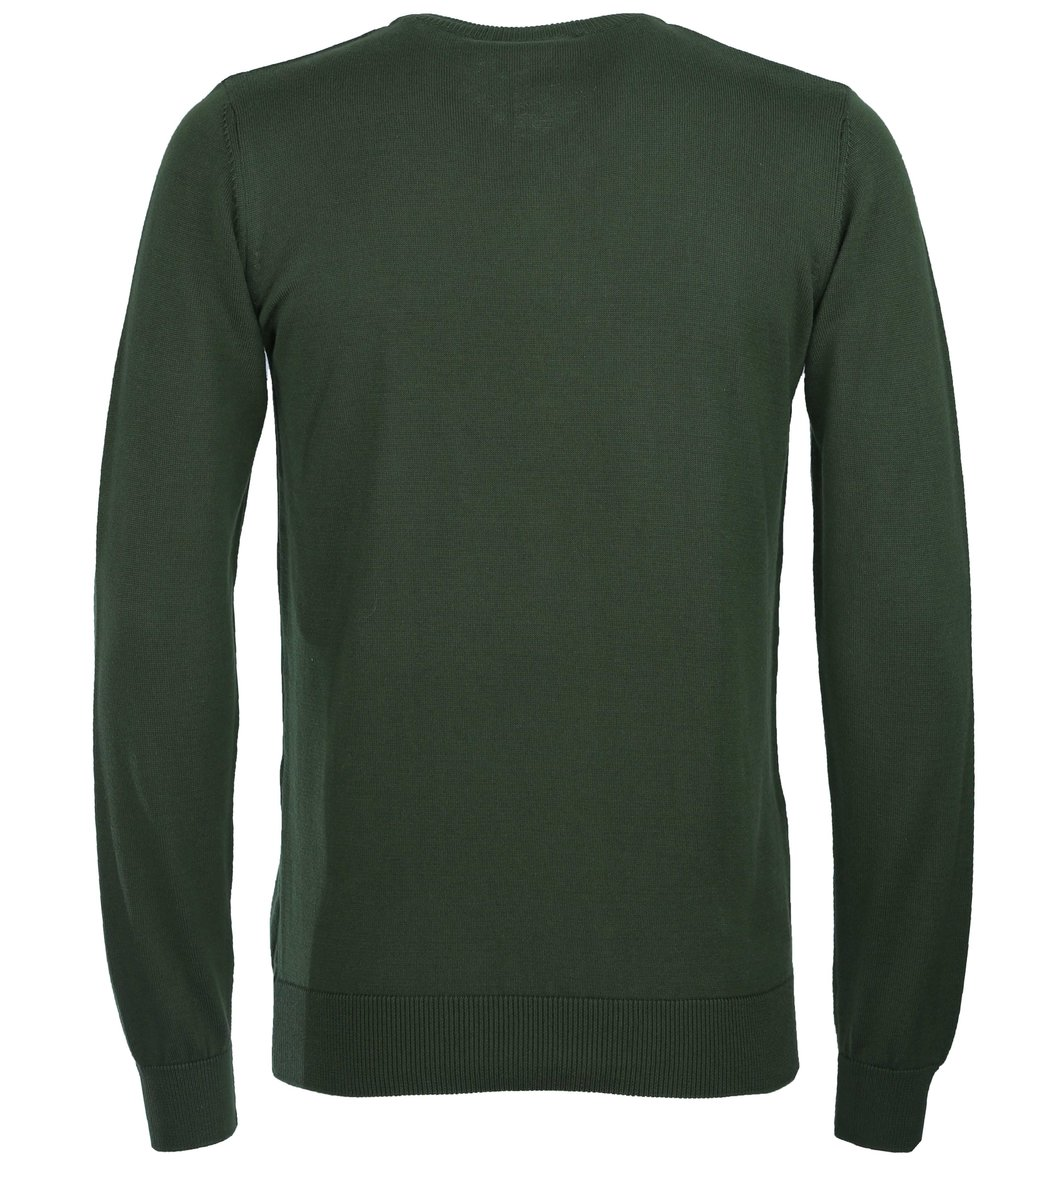 Тёмно-зелёный пуловер Lacoste VL5